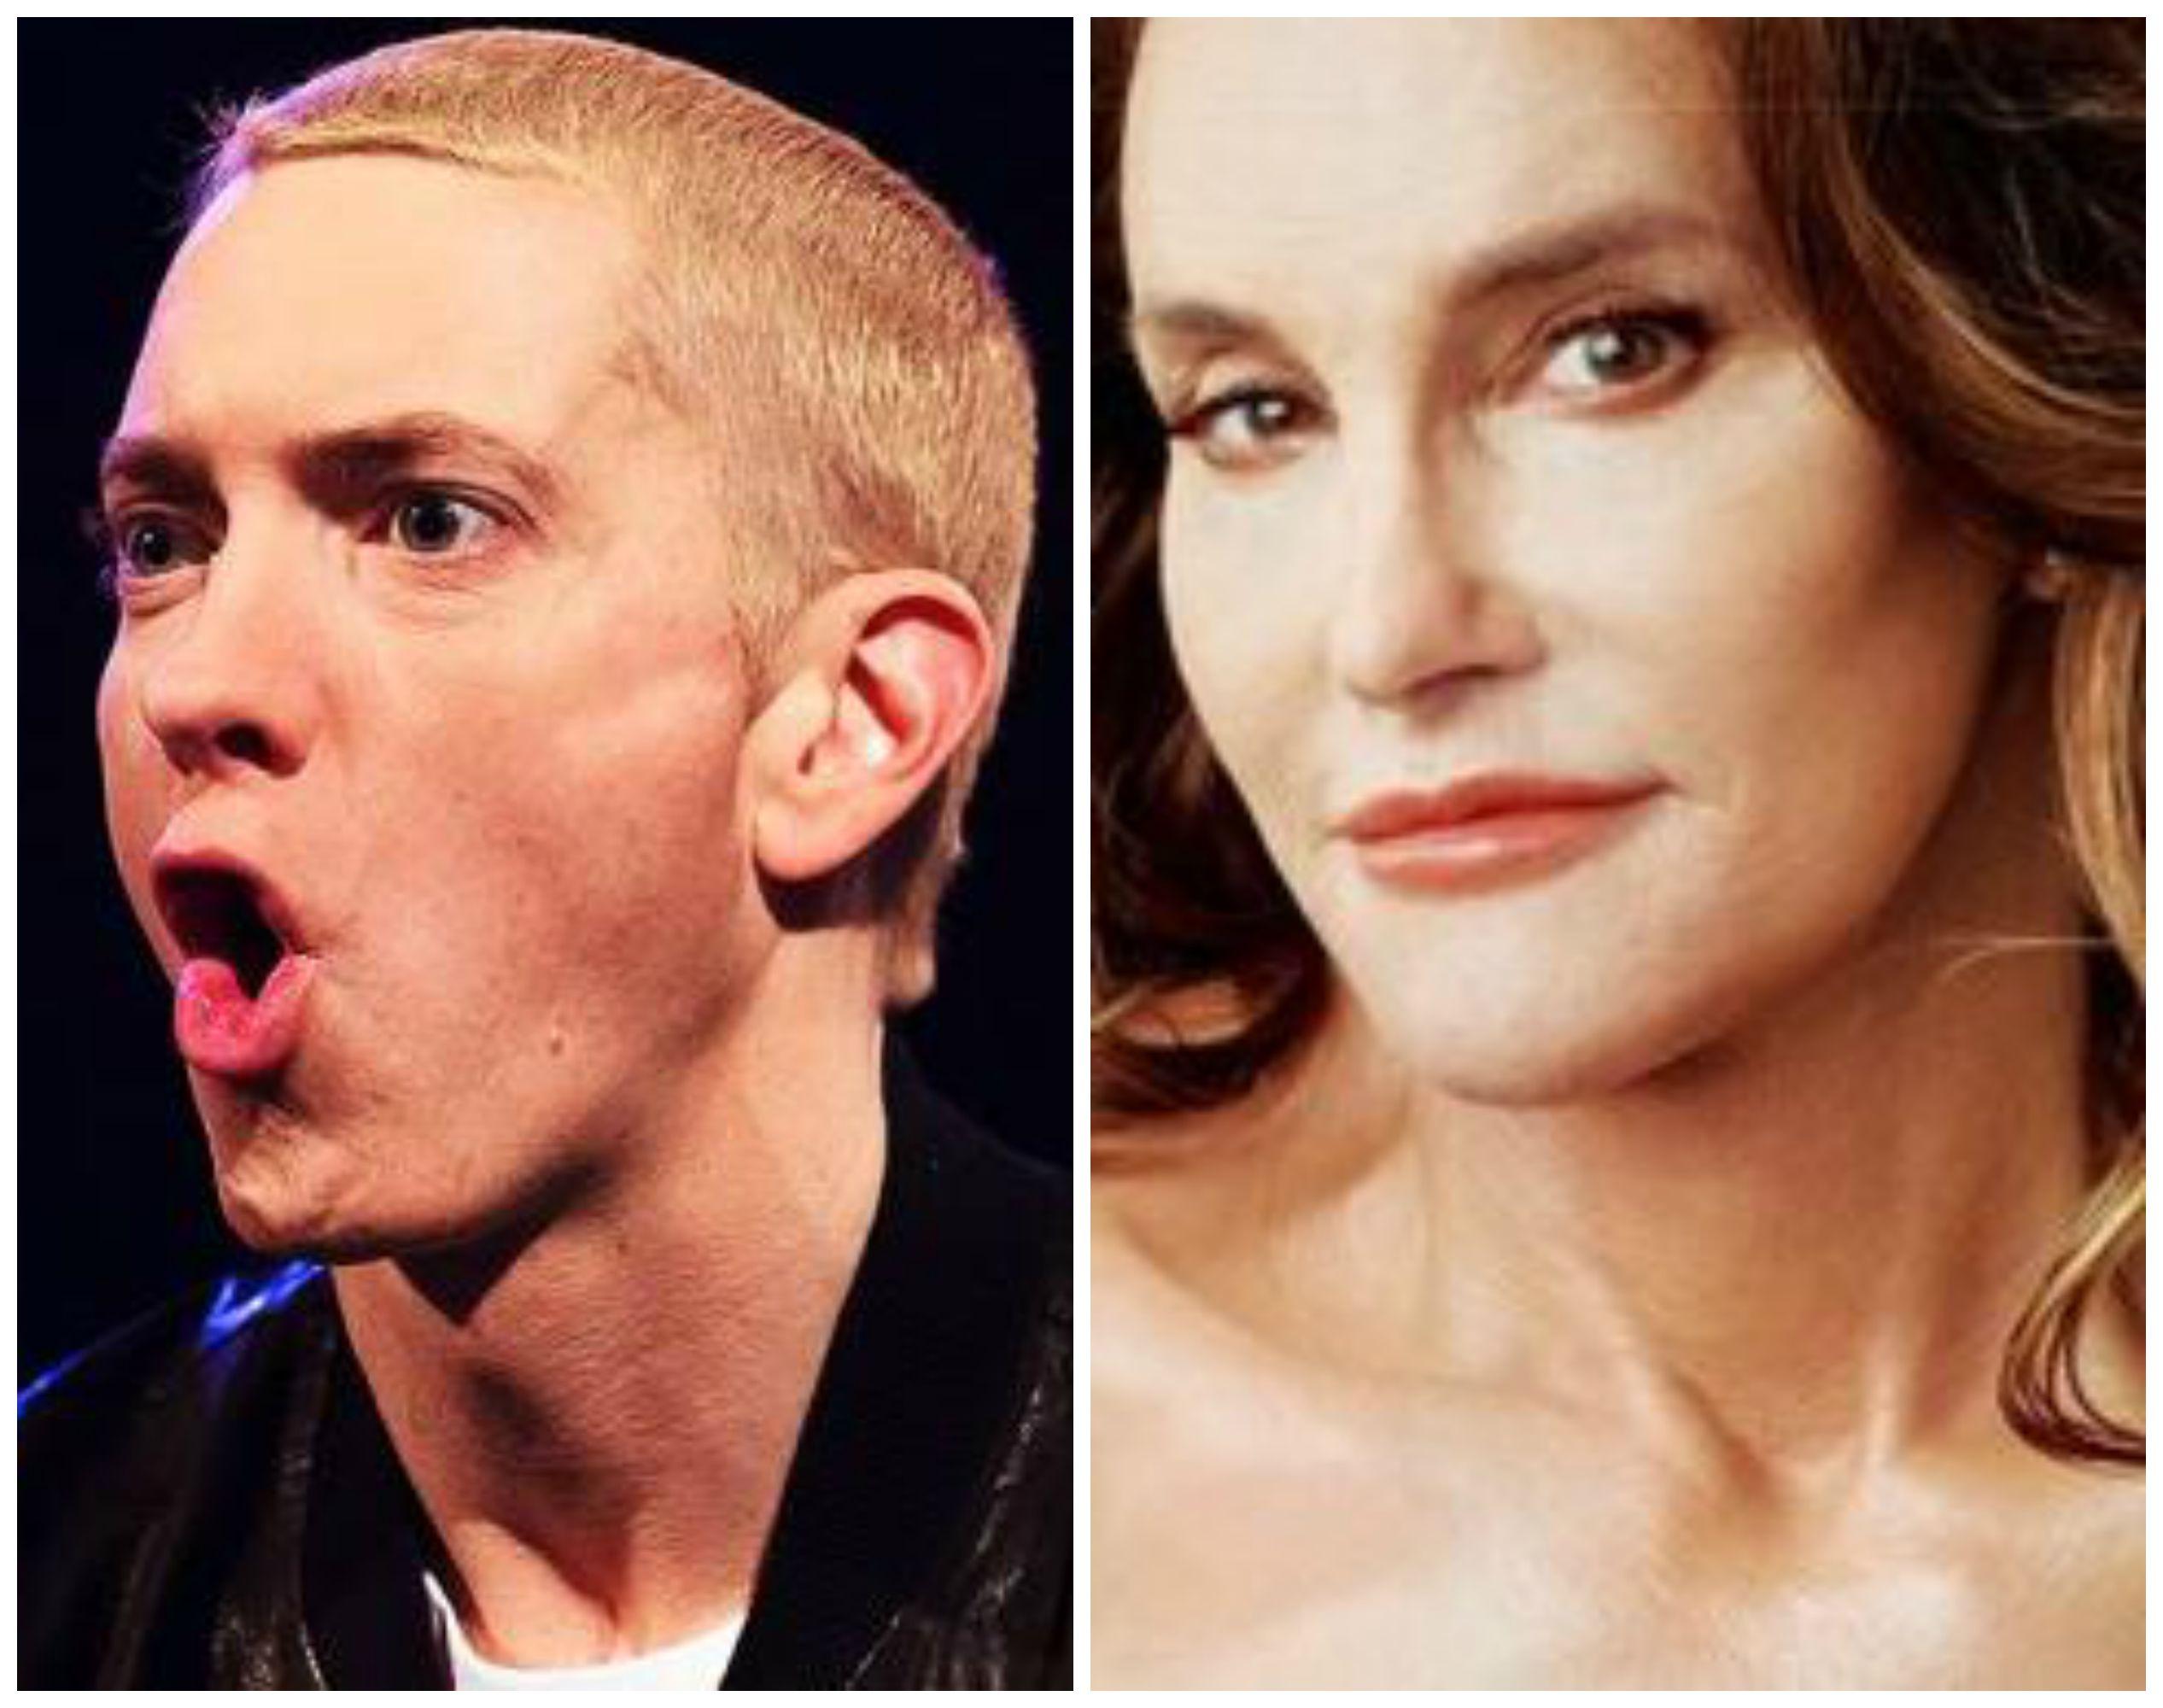 Eminem and Caitlyn